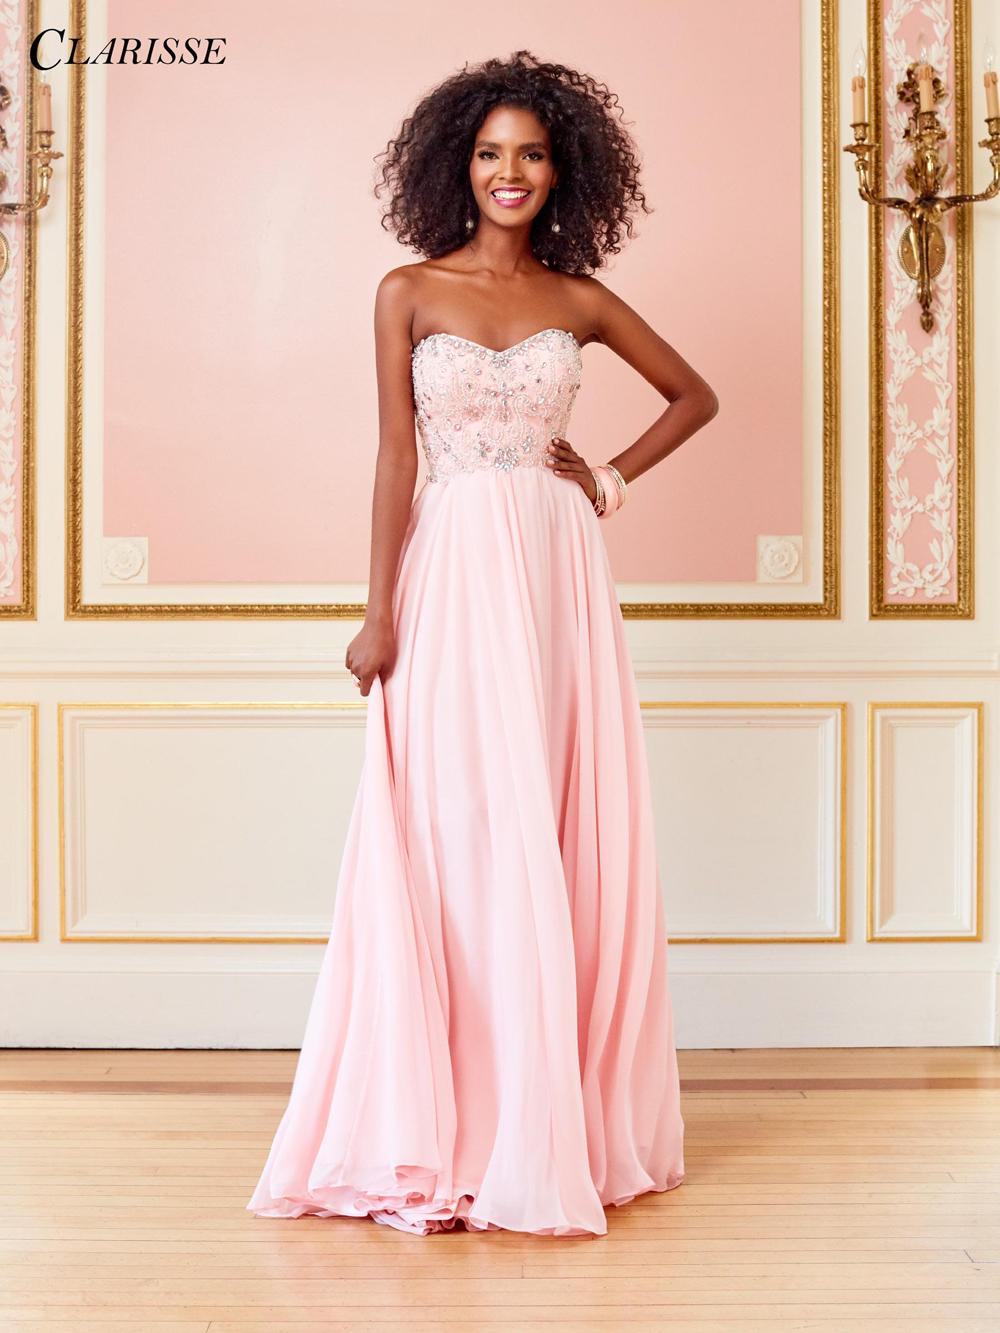 0c87043573d Clarisse 3472 Dress - MadameBridal.com